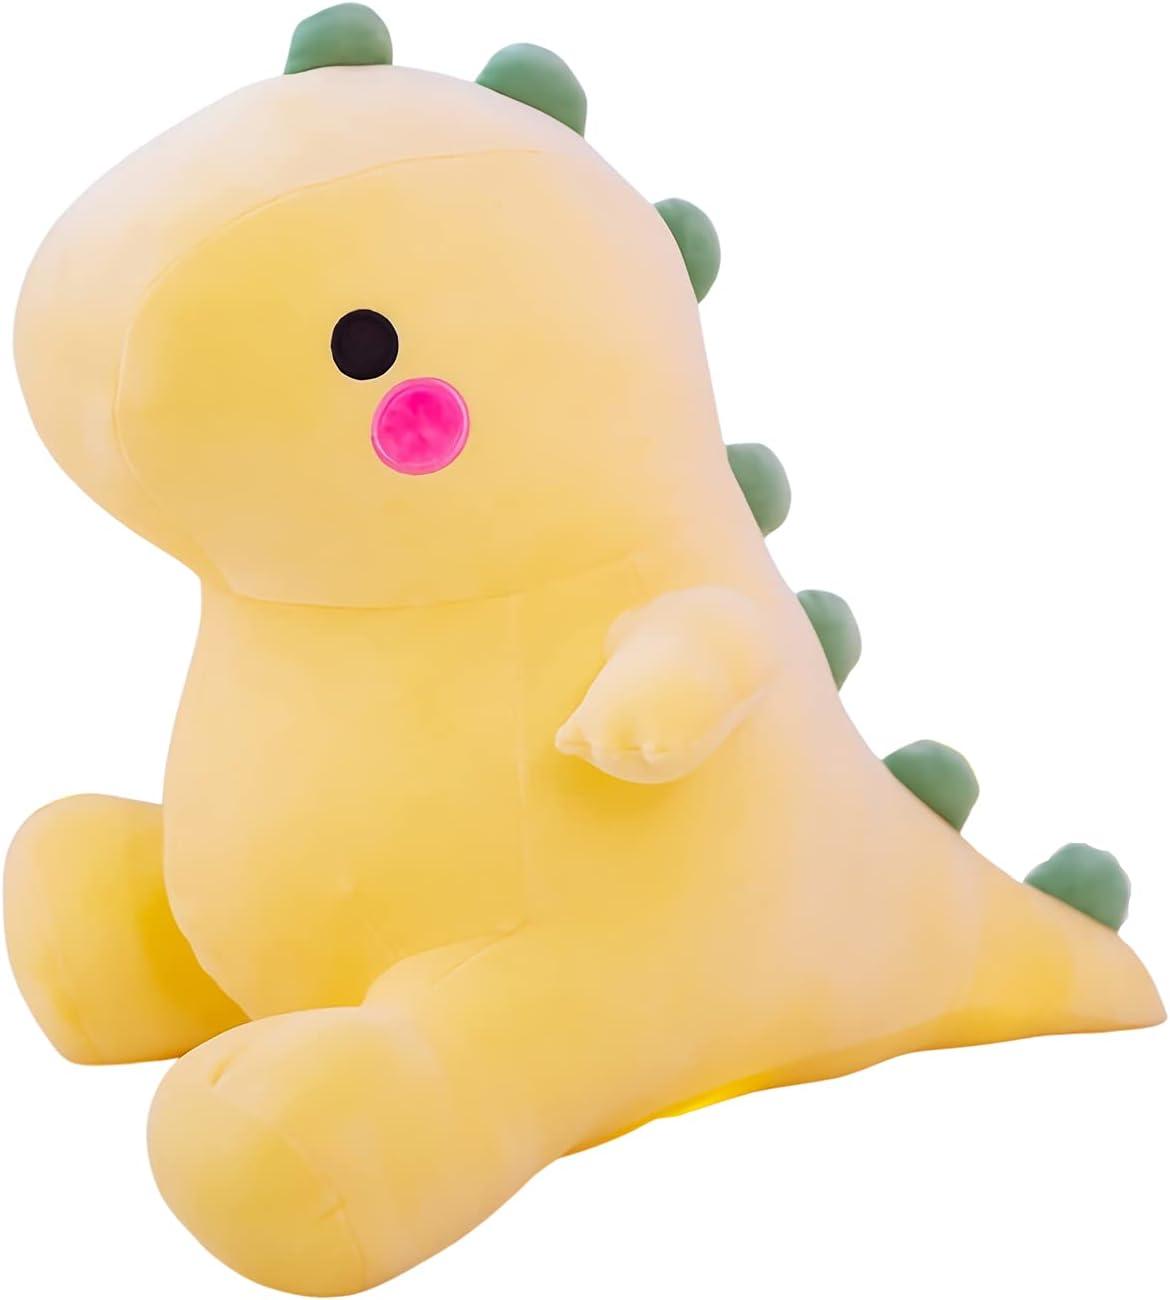 VICKYPOP Dinosaur Plush Toy Soft Dino Do Max 90% Max 89% OFF OFF Animal Plushies Stuffed